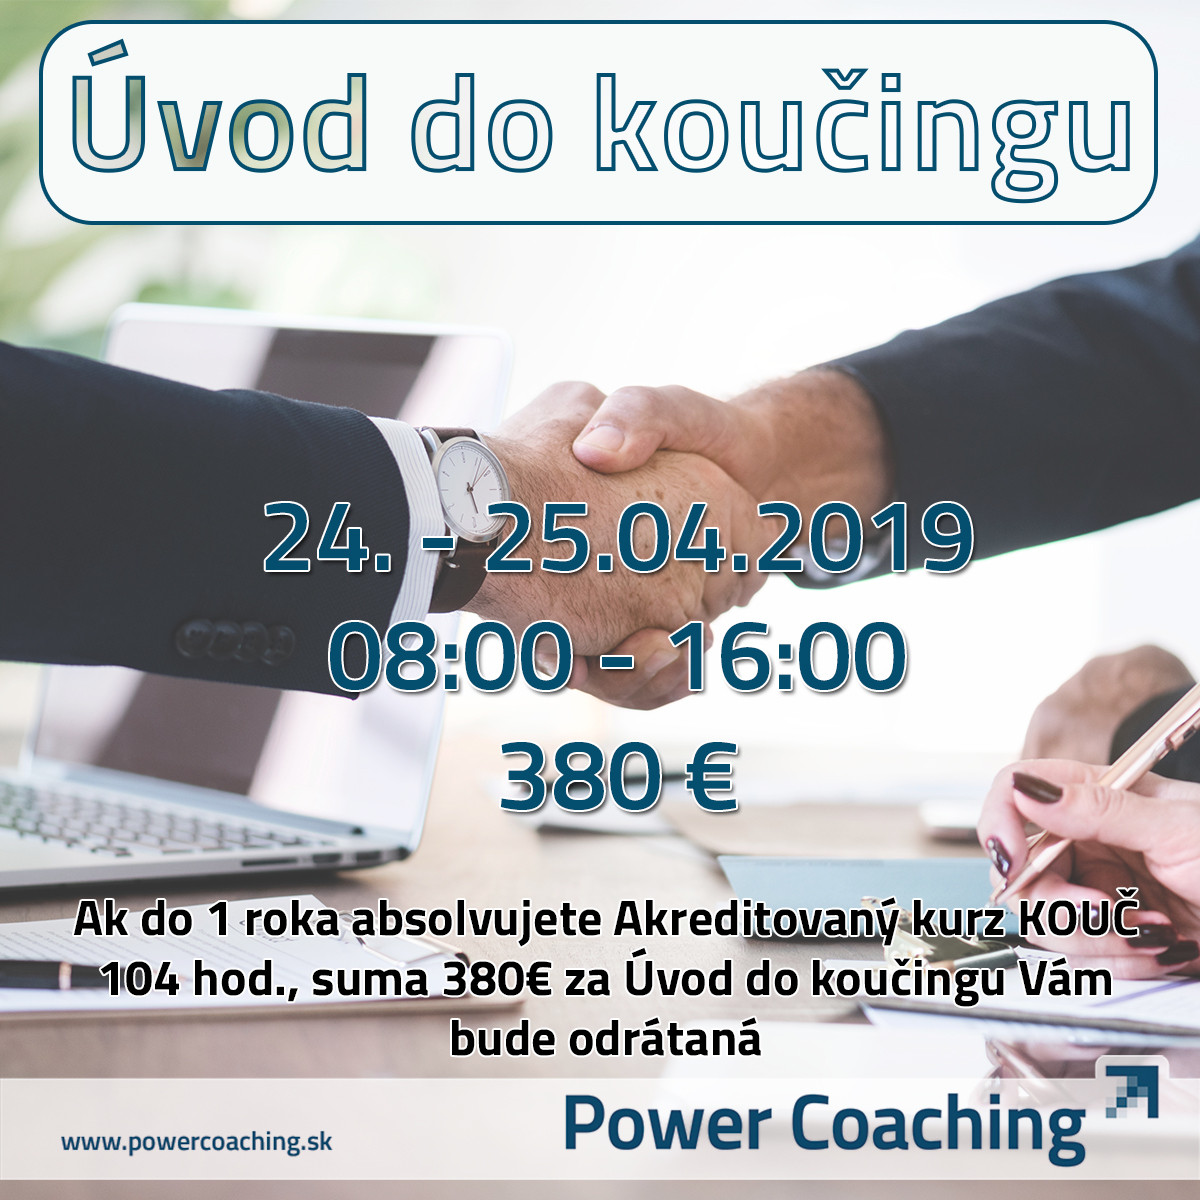 Úvod do koučingu Košice